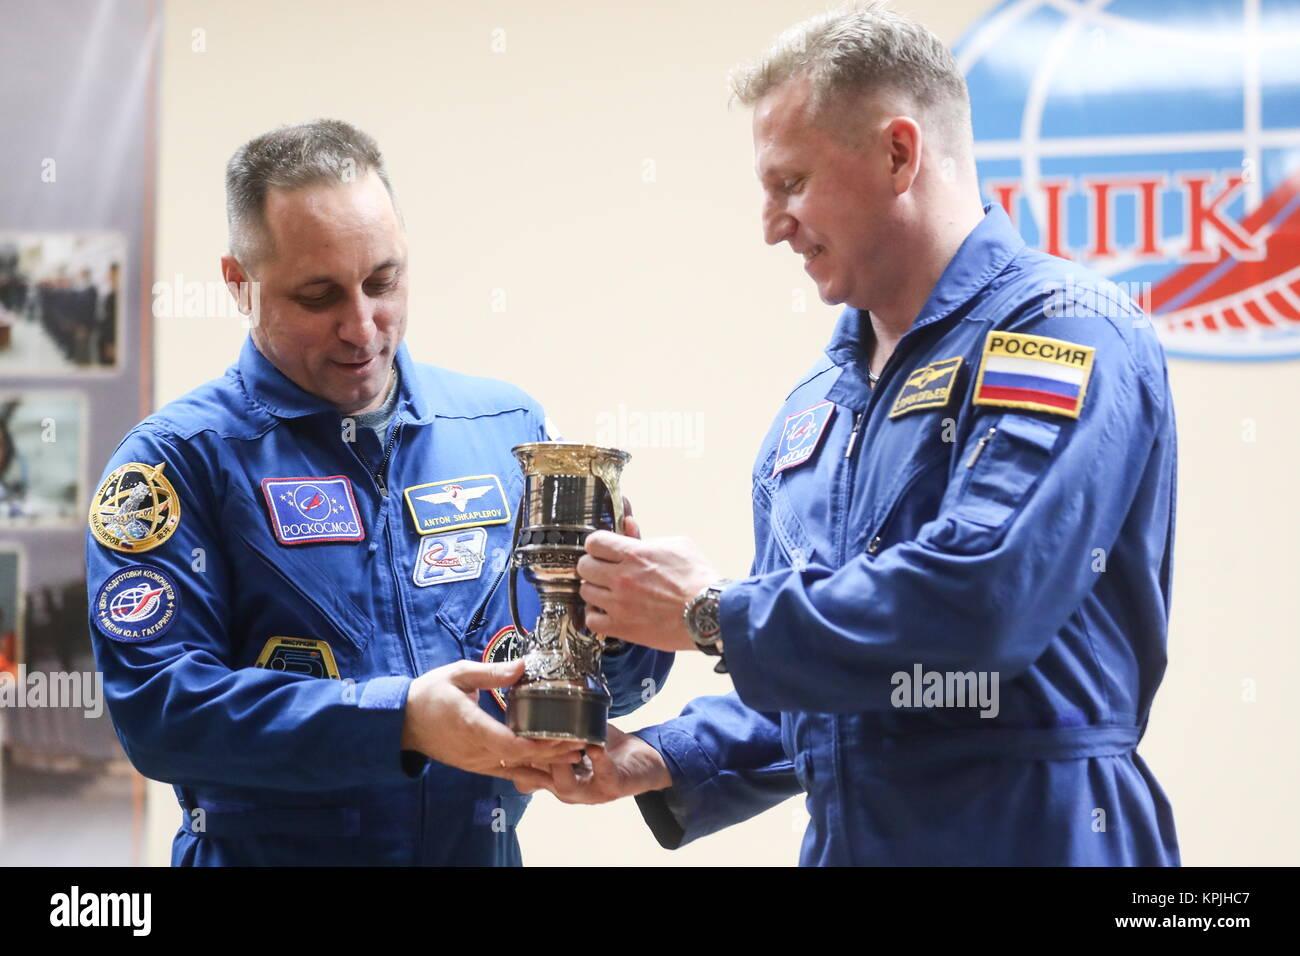 Baikonur, Kazakhstan. 16th Dec, 2017. Roscosmos cosmonauts Anton Shkaplerov (L) and Sergei Prokopyev of ISS Expedition Stock Photo